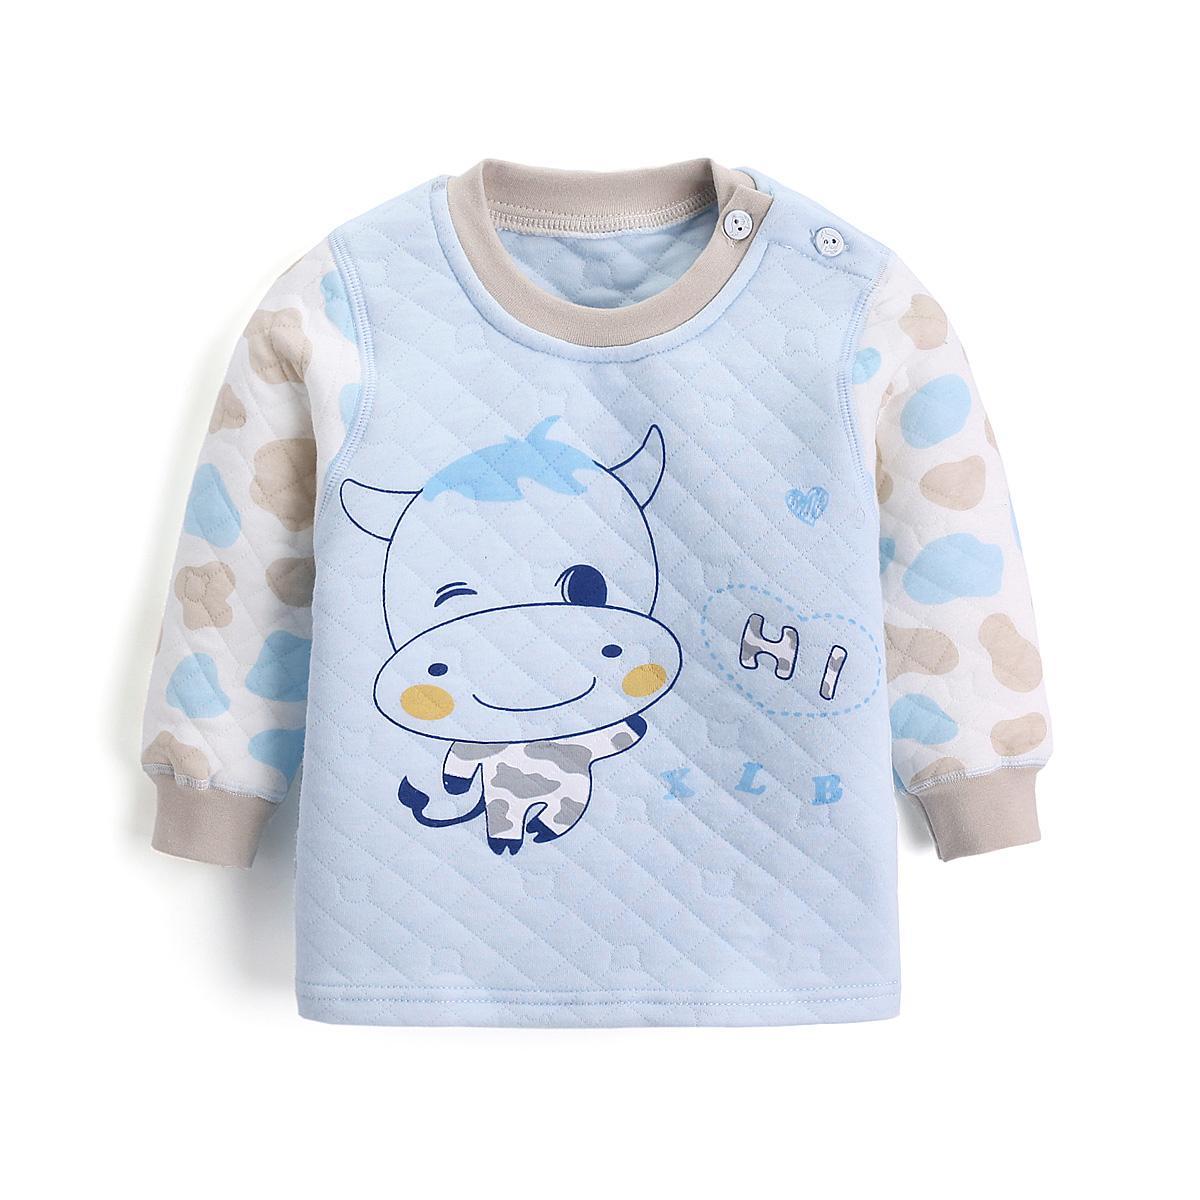 Petpet Penghangat Atasan Musim Dingin 1-3 tahun 2 bayi baju musim gugur Lebih tebal